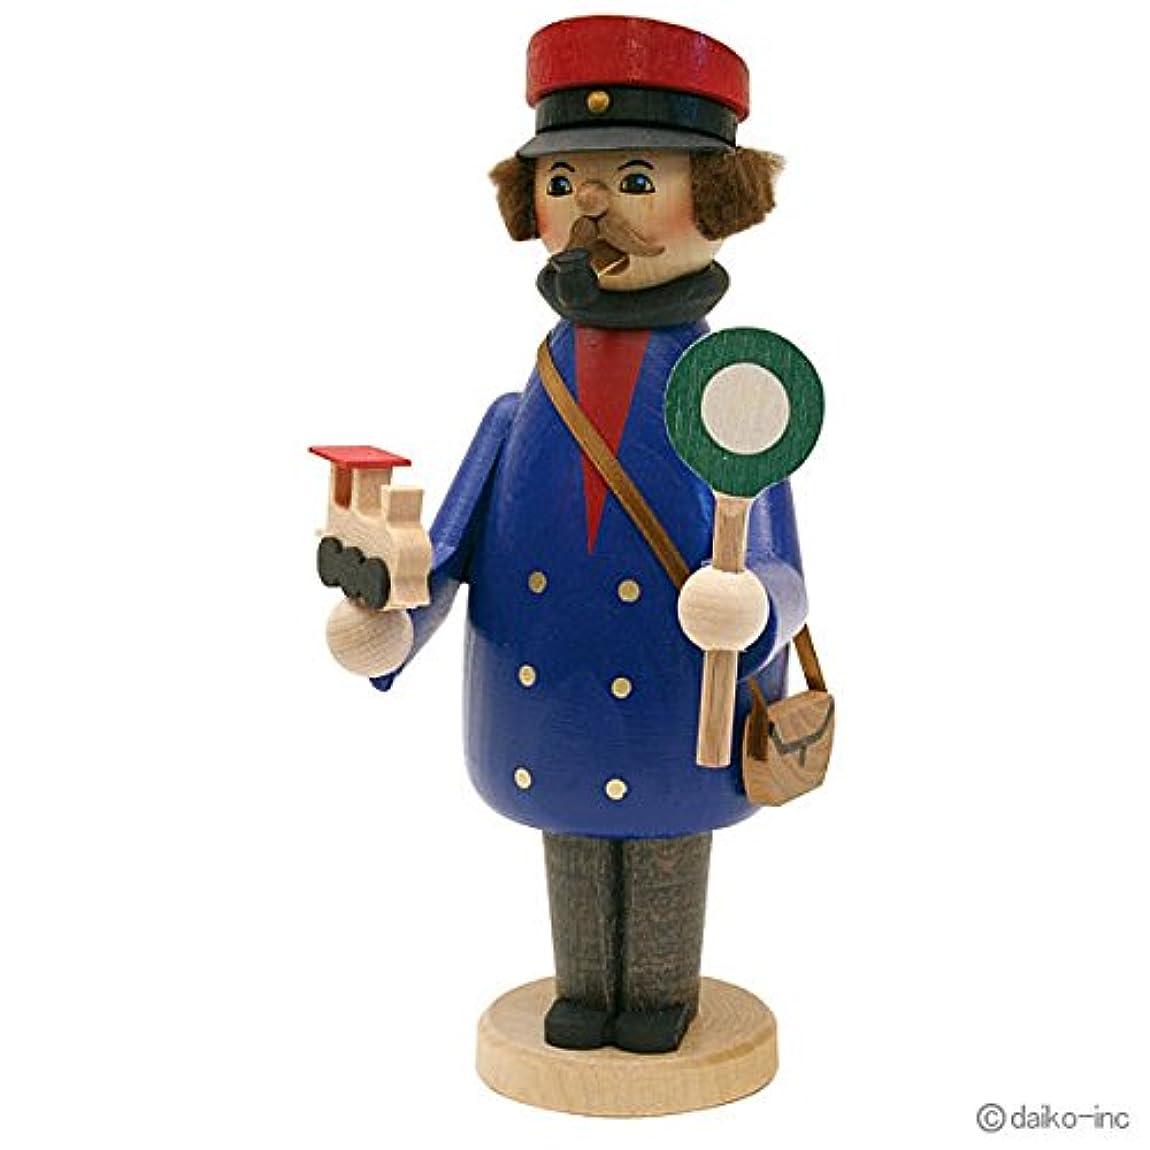 kuhnert ミニパイプ人形香炉 鉄道員